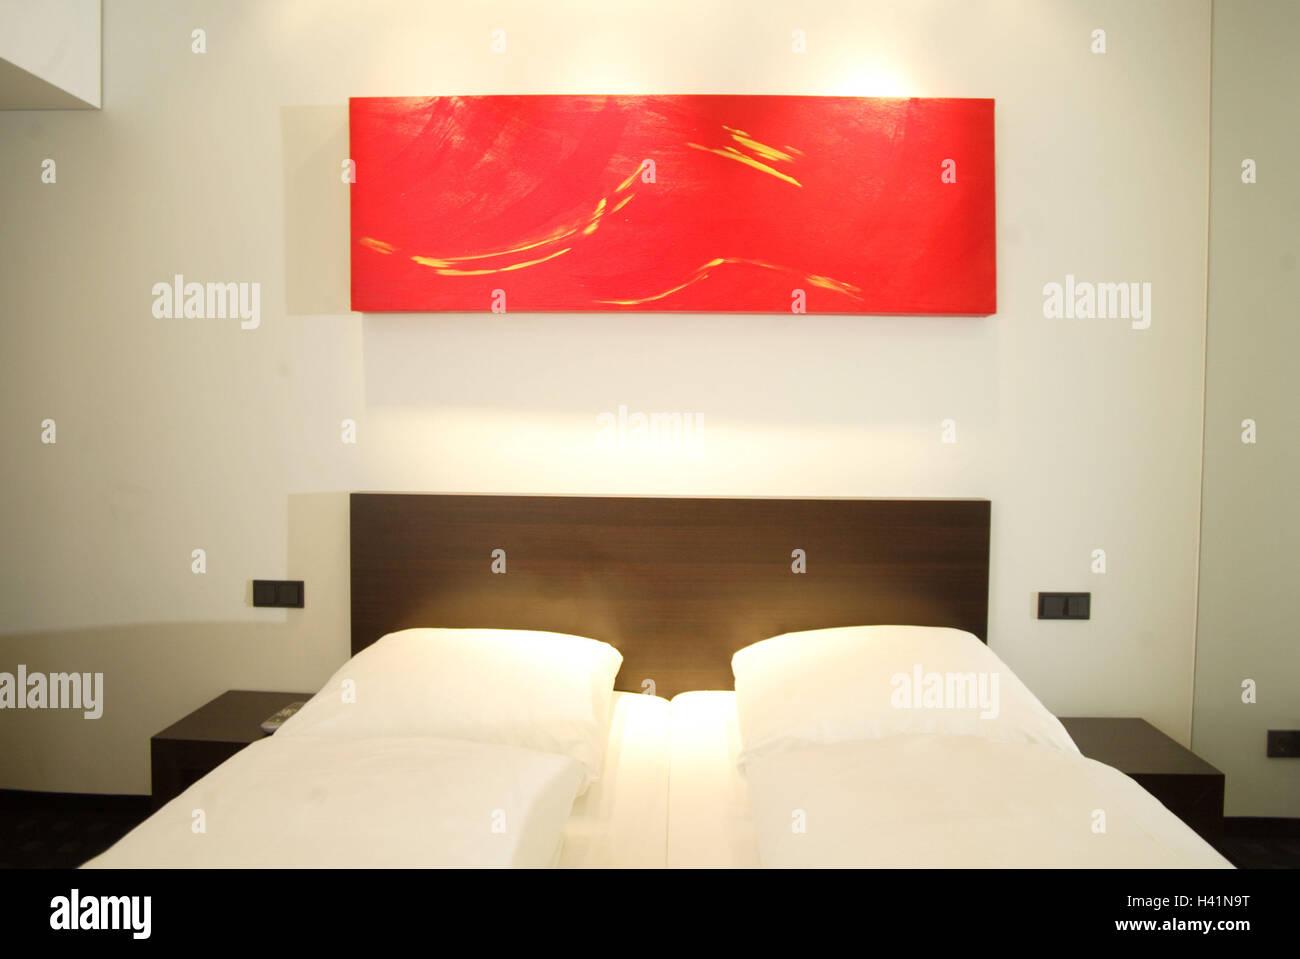 Schlafzimmer, Doppelbett, Wand, Bild, rot, innen geschossen, Zimmer ...